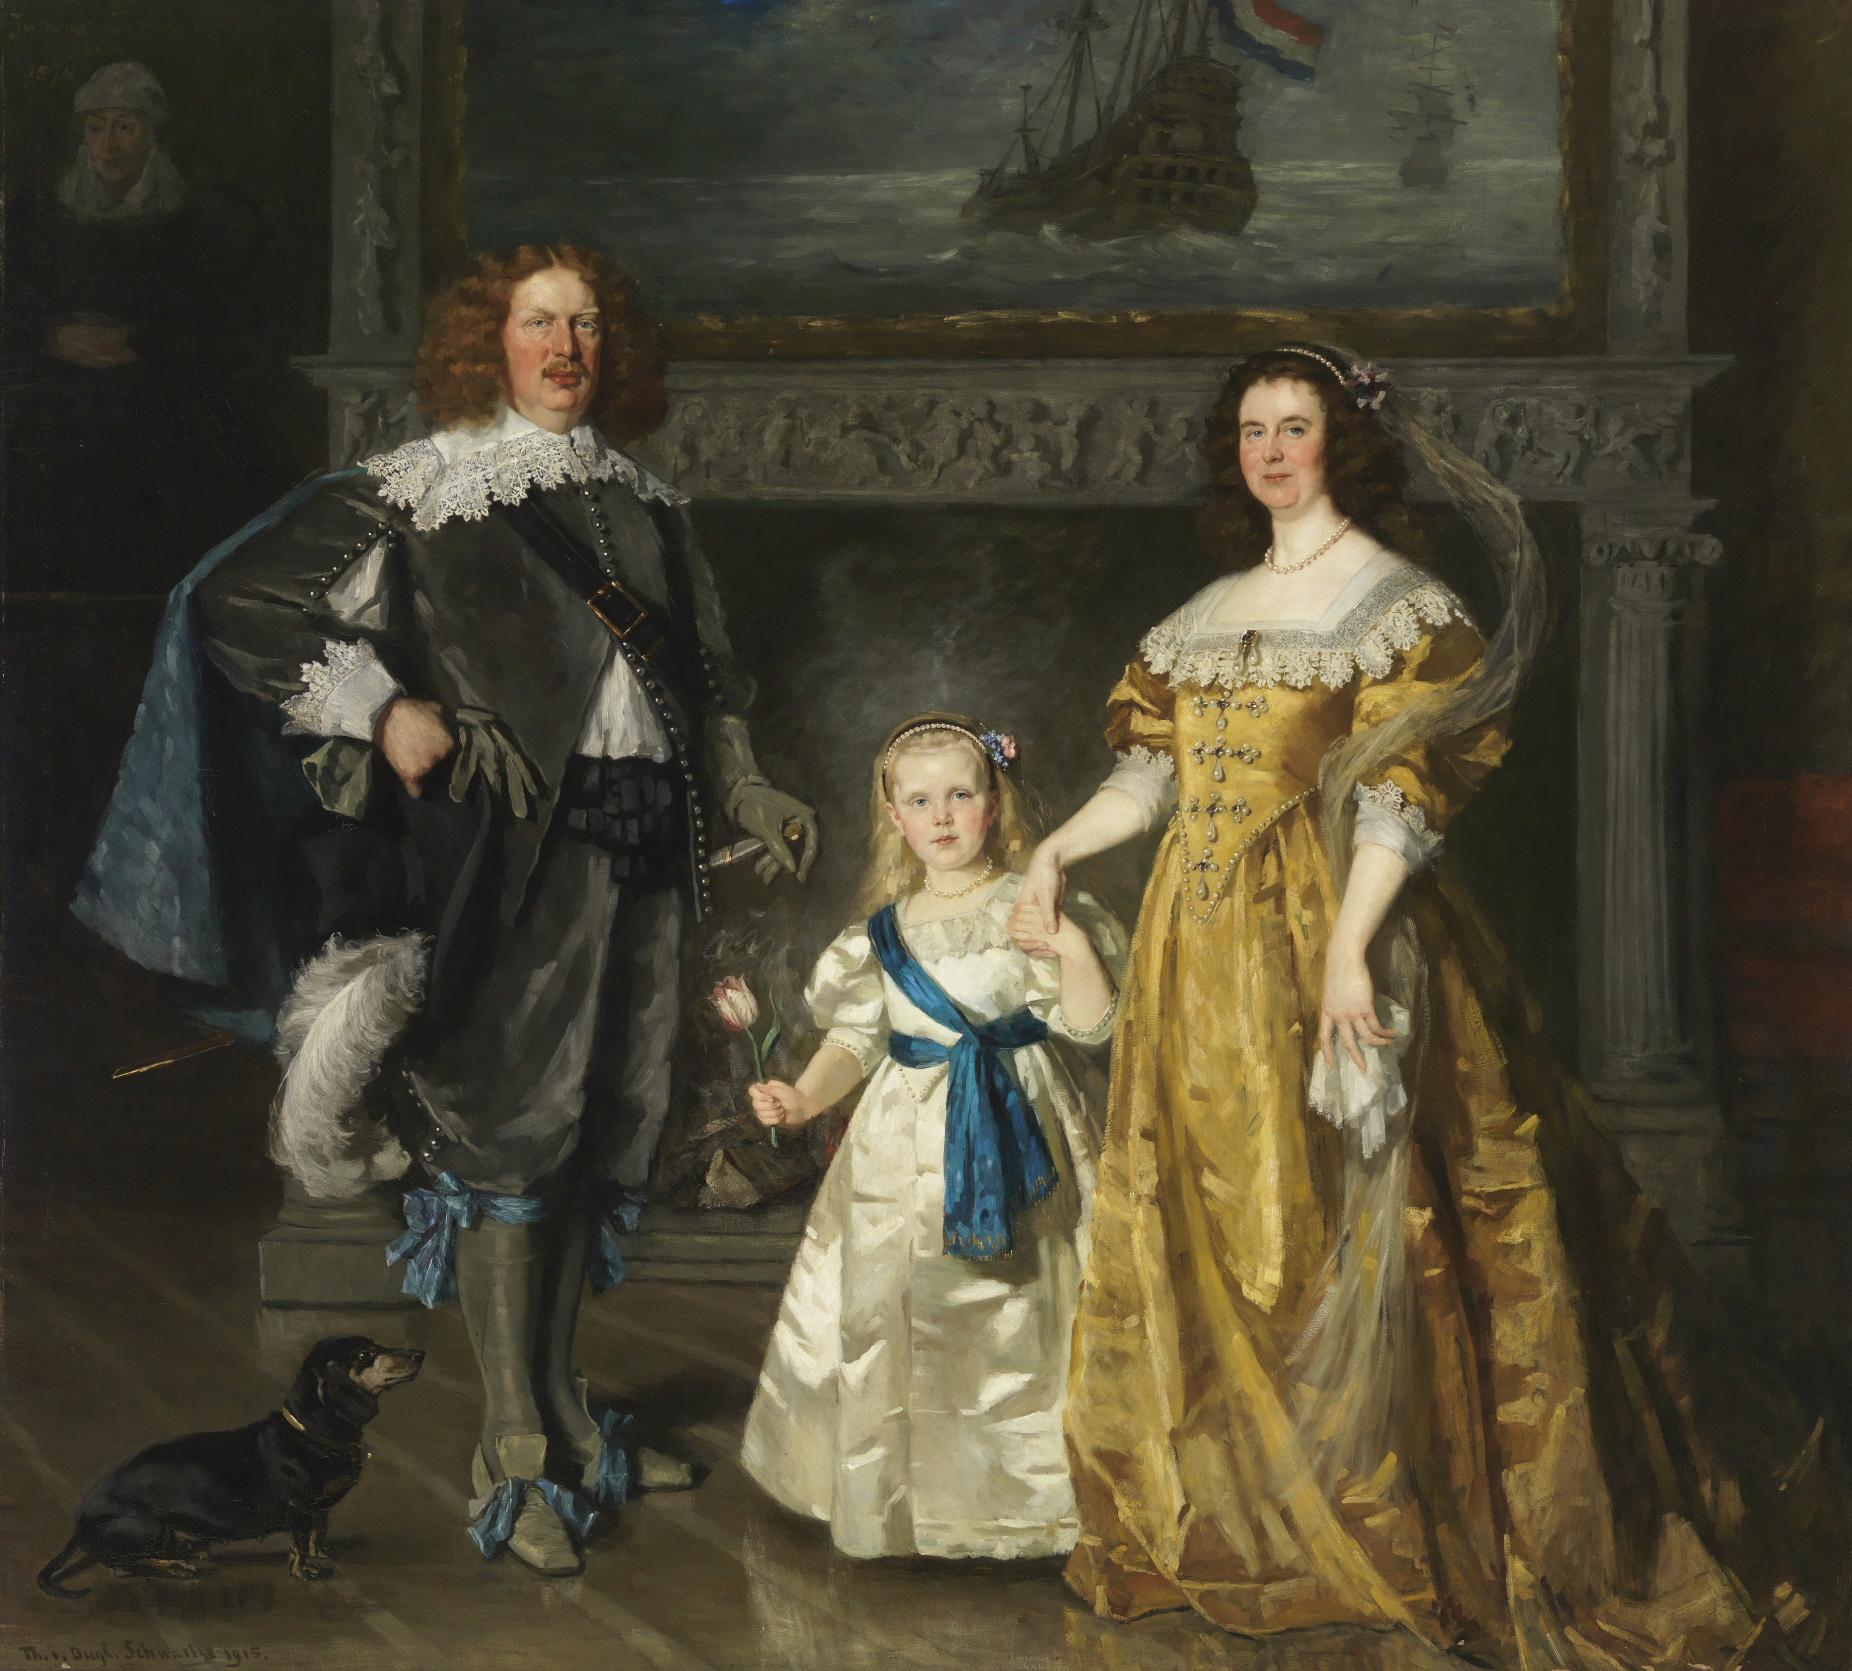 The Royal Family with Queen Wilhelmina van Oranje-Nassau, prince Hendrik van Mecklenburg-Schwerin and princess Juliana van Oranje-Nassau in historical outfits.